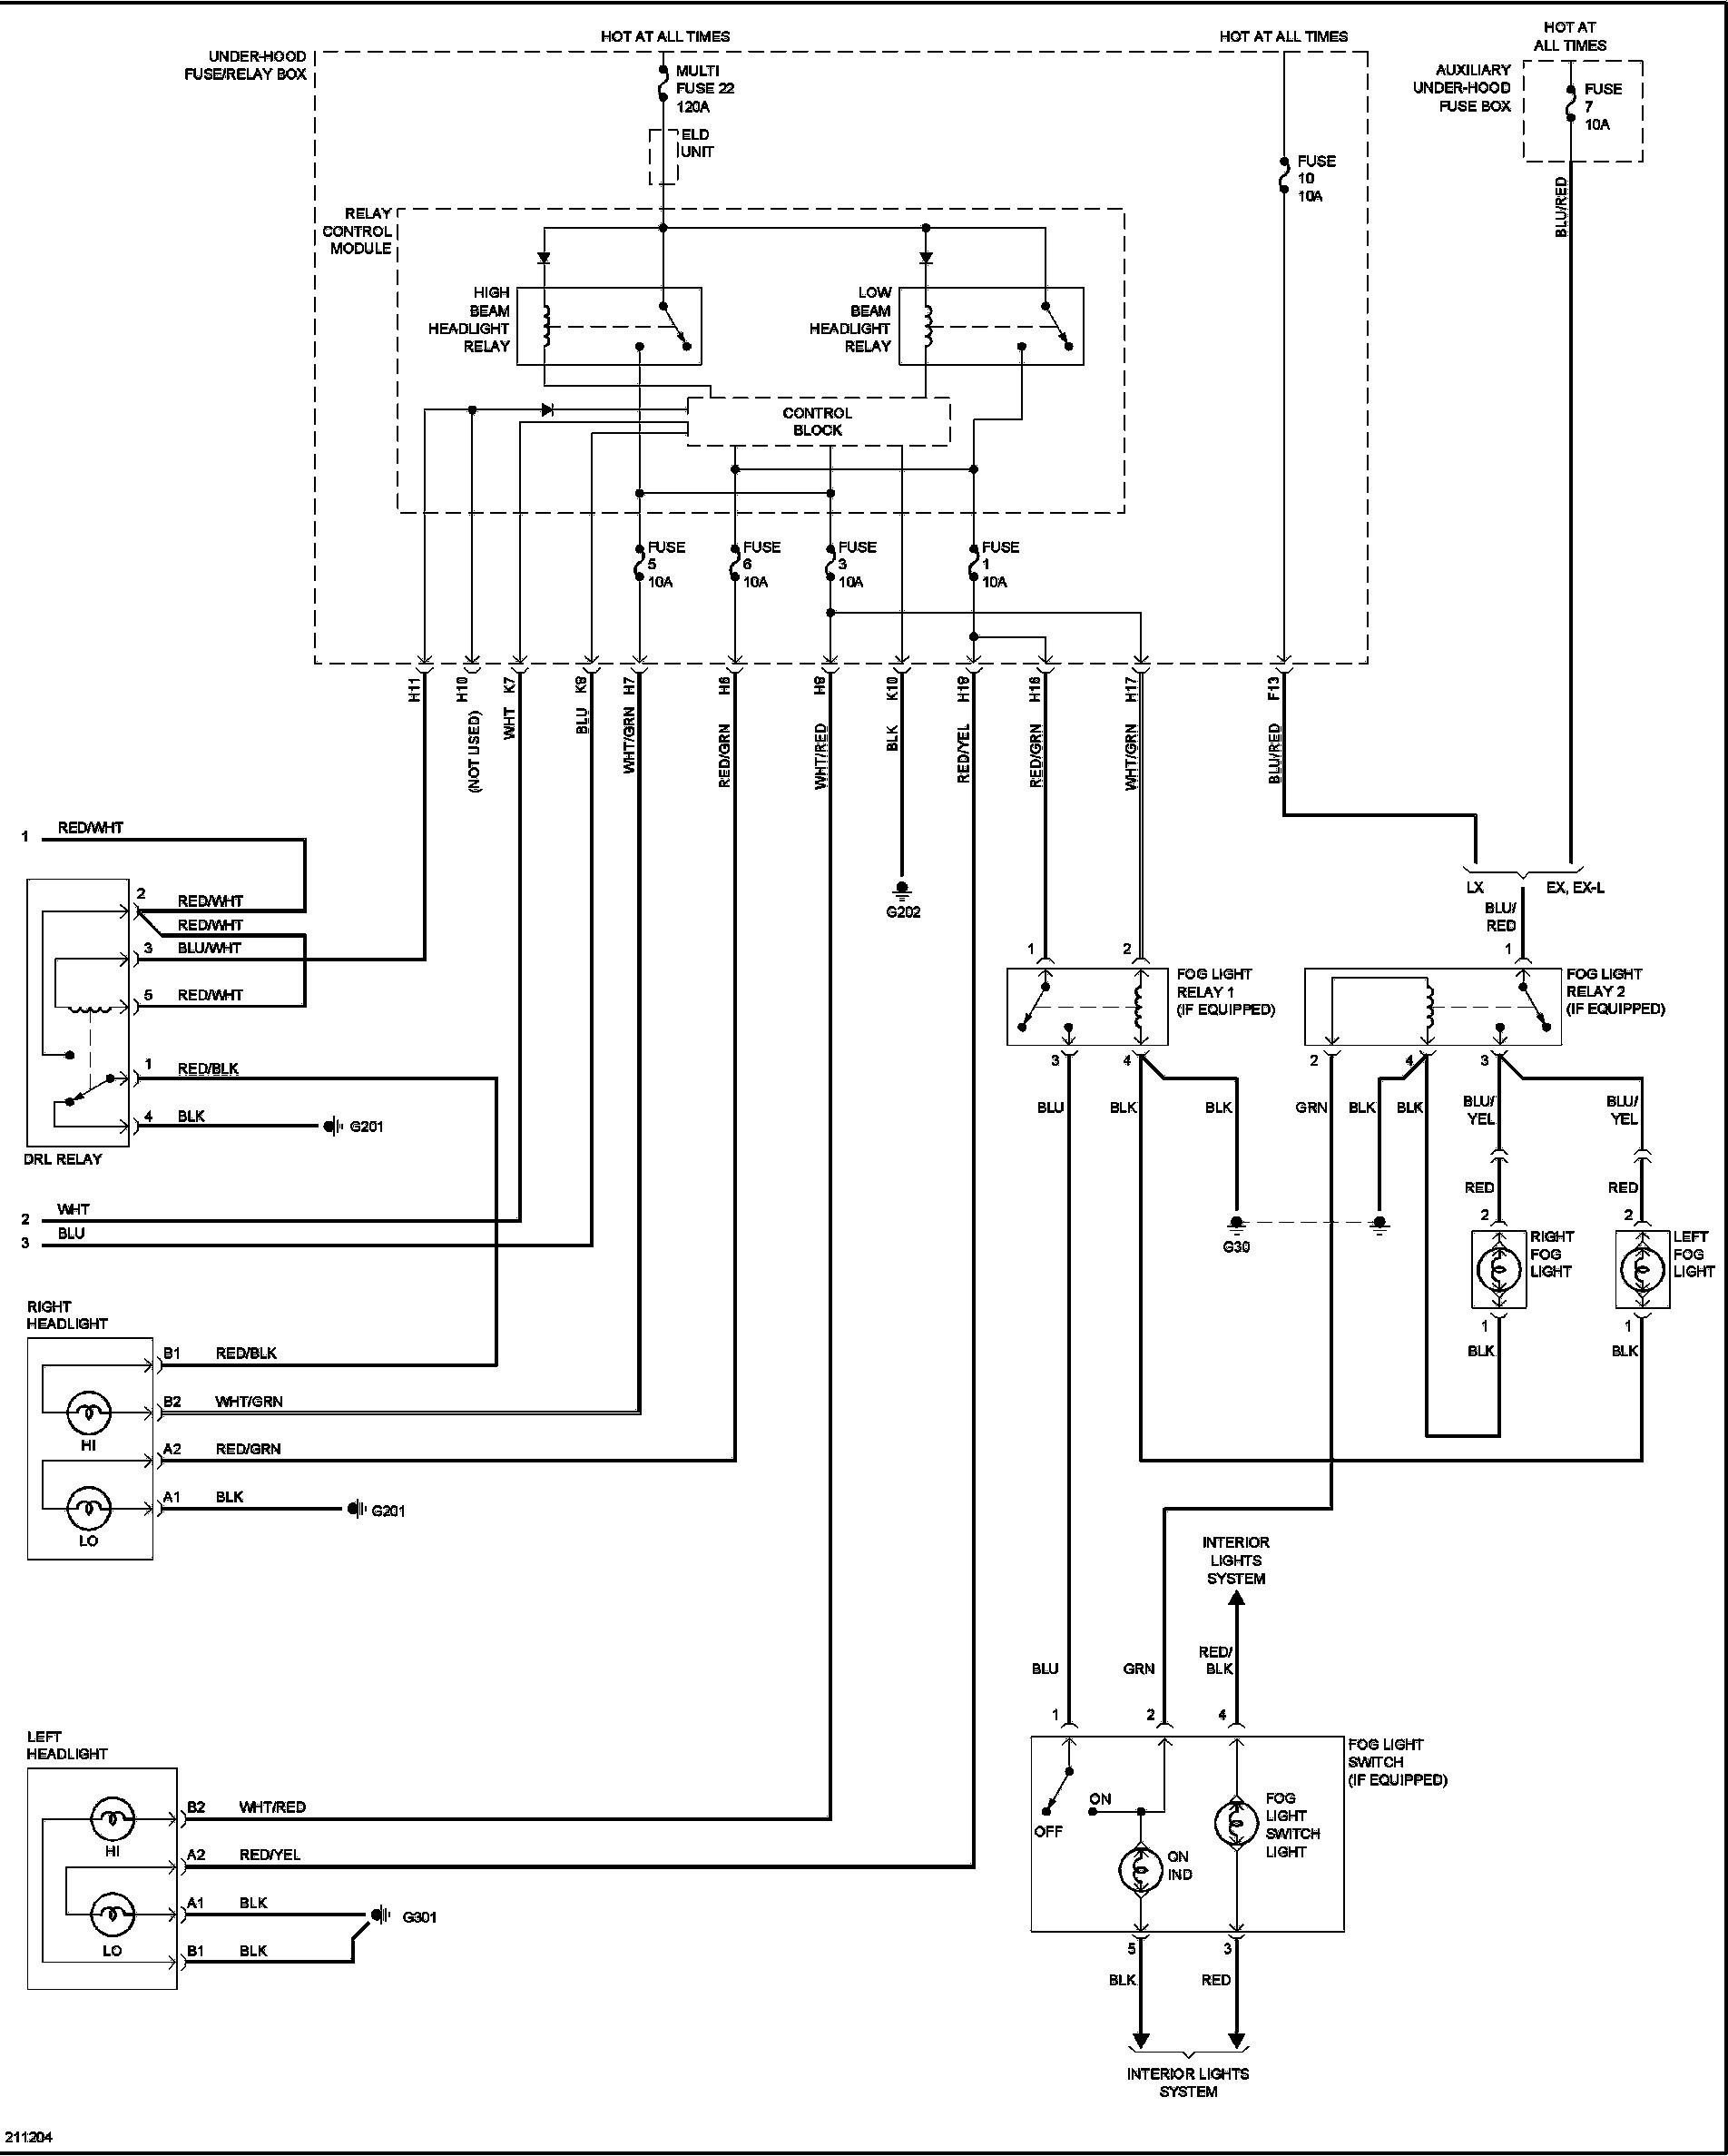 2002 Honda Civic Wiring Schematics Pool Light Wiring Diagram Of 2002 Honda Civic Wiring Schematics